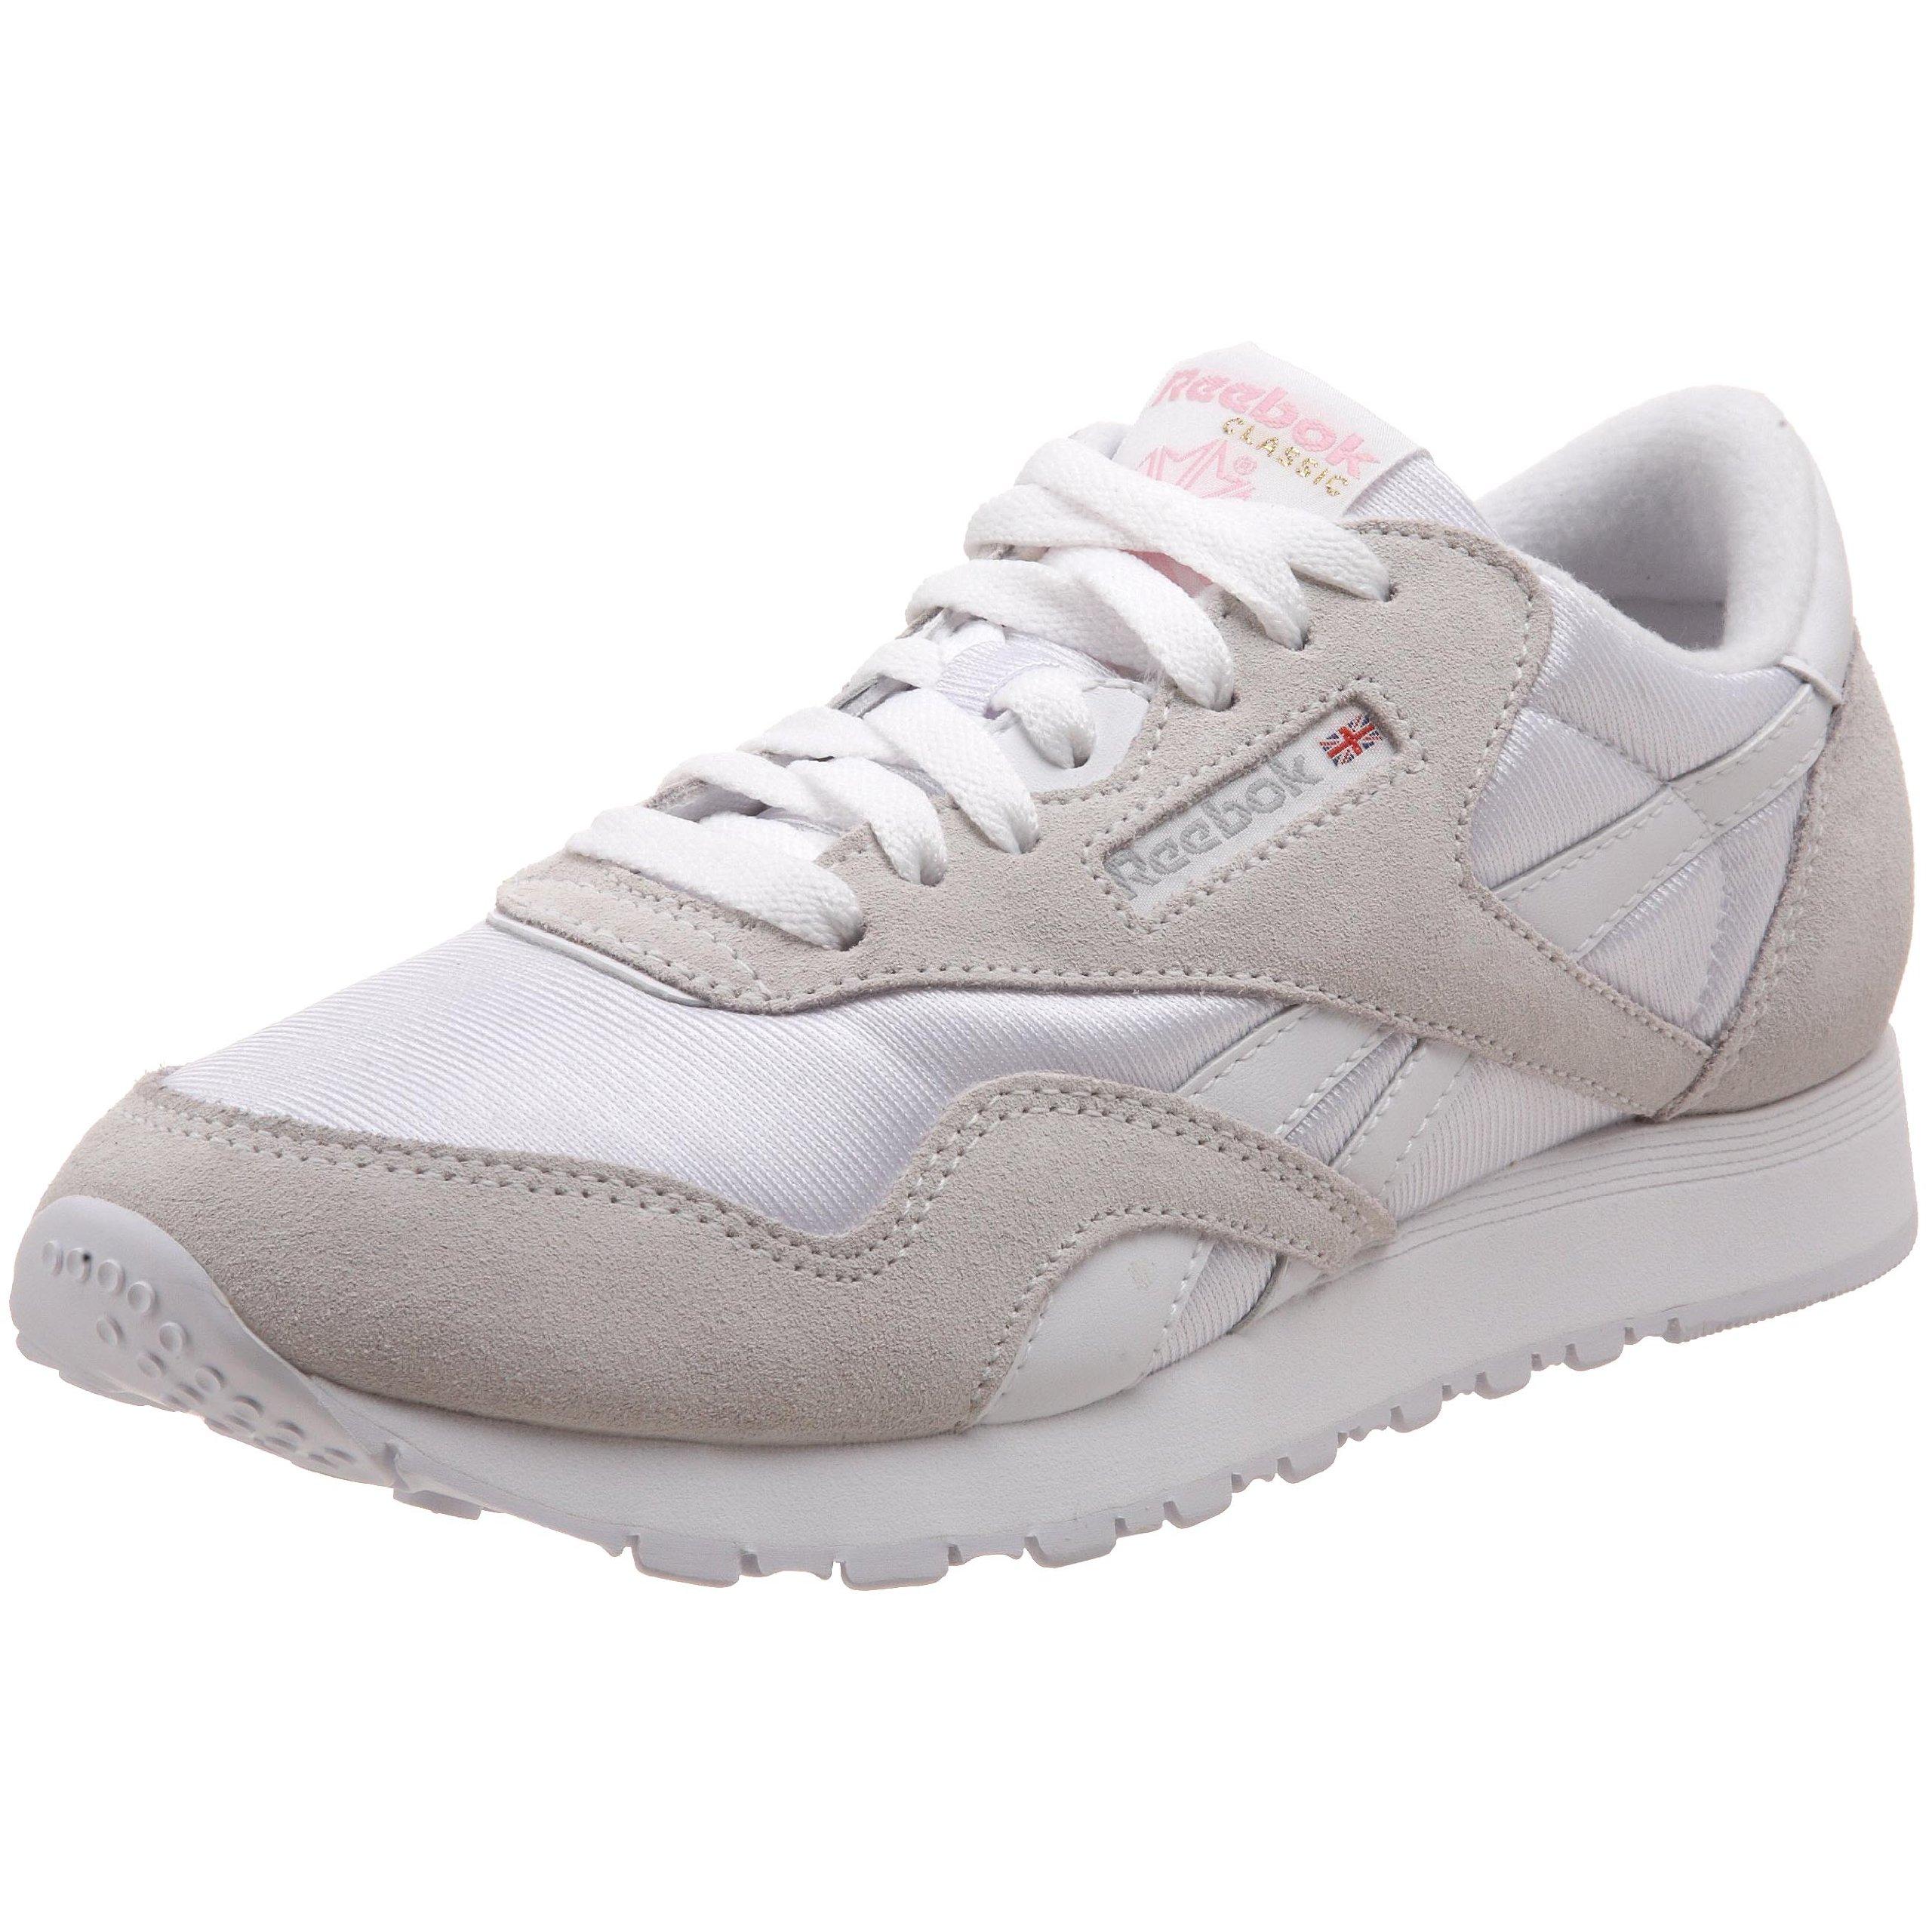 Reebok Women's Classic Nylon Sneaker, White/Light Grey, 11 M US